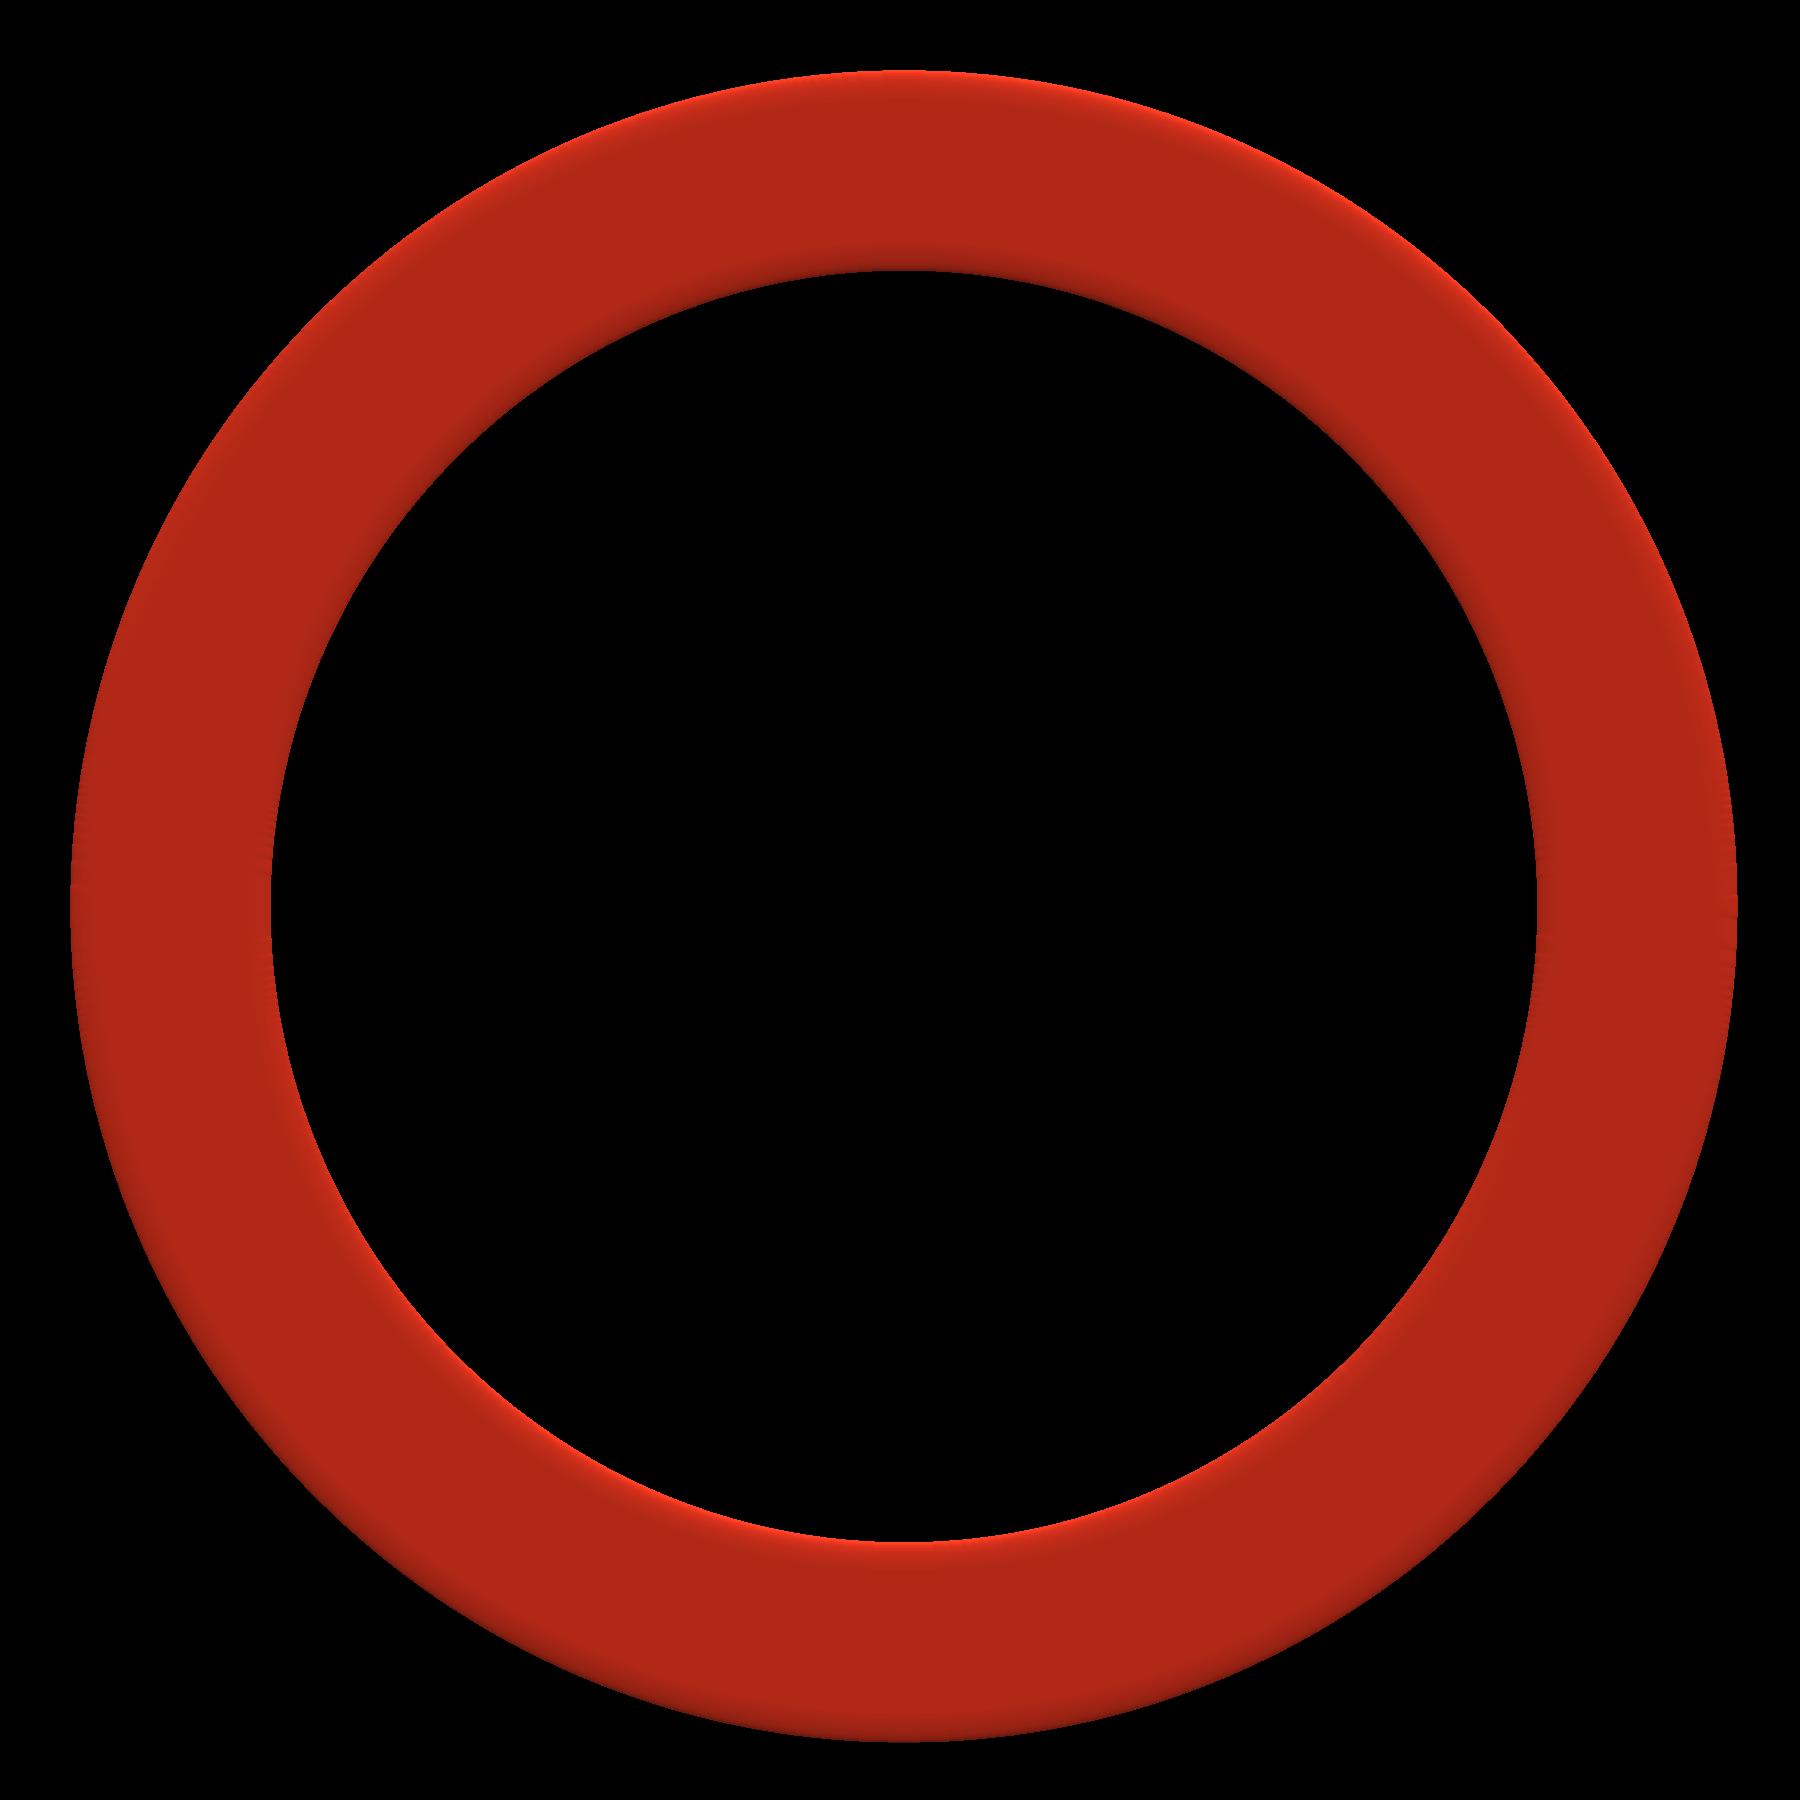 Circle PNG Images Transparent Free Download.